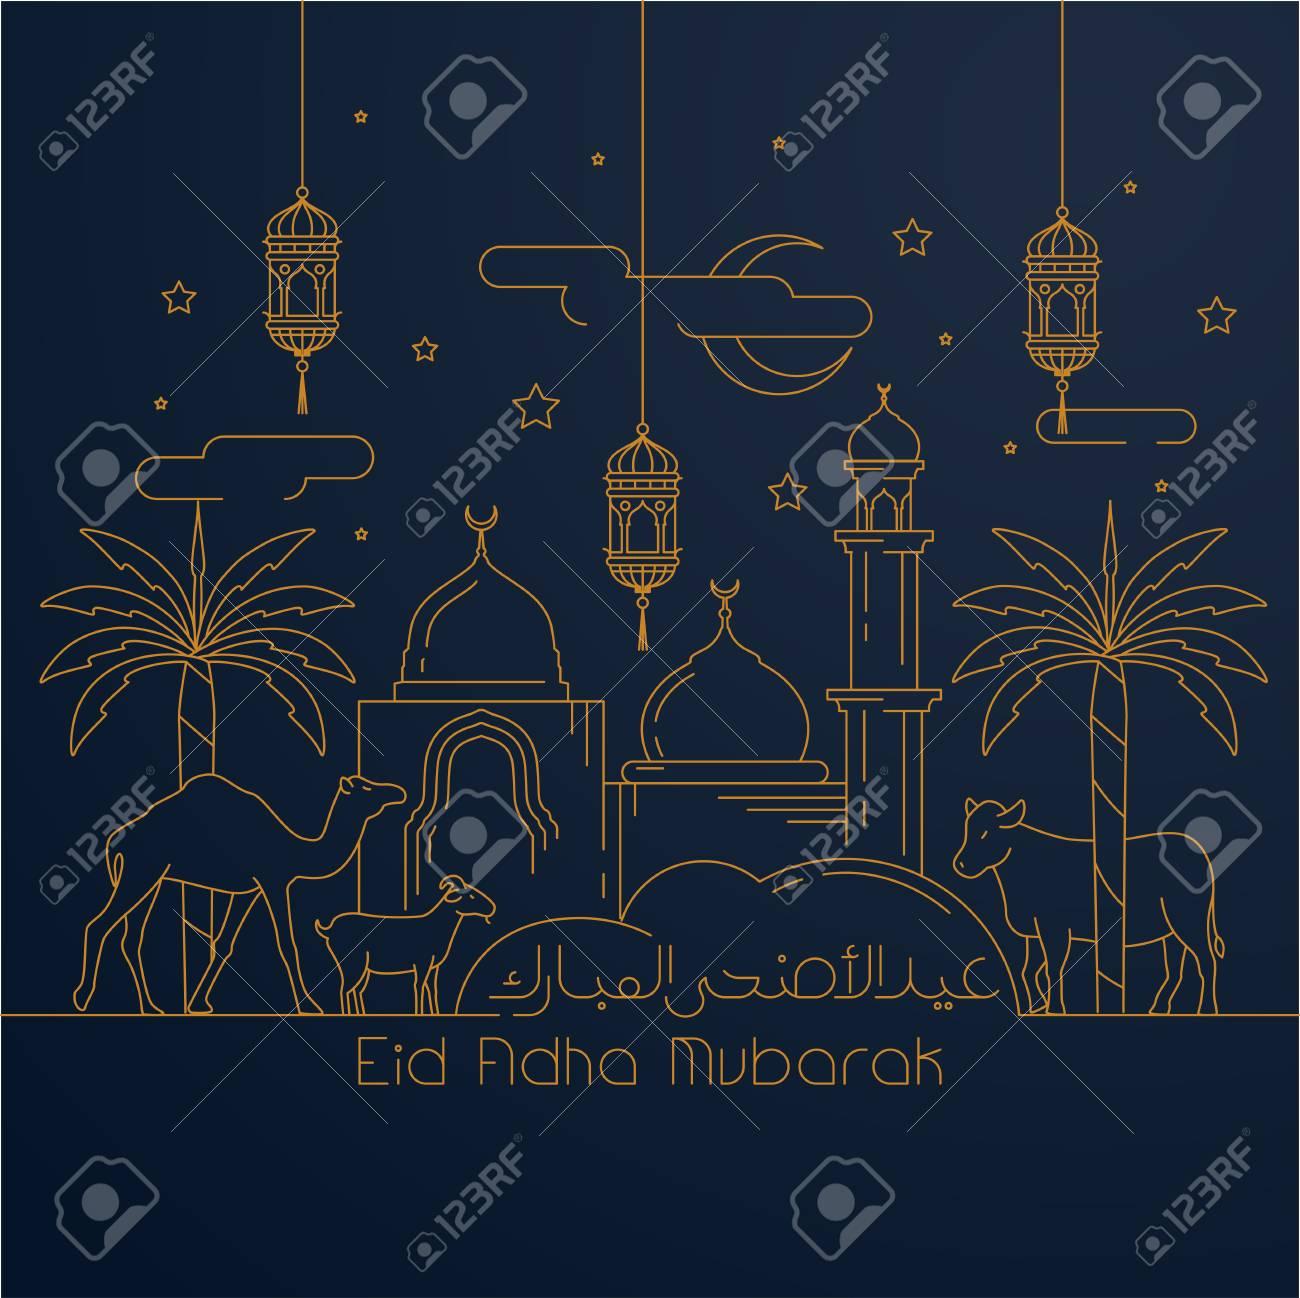 Monoline illustration greeting card islamic celebration Eid Adha Mubarak - 101048682